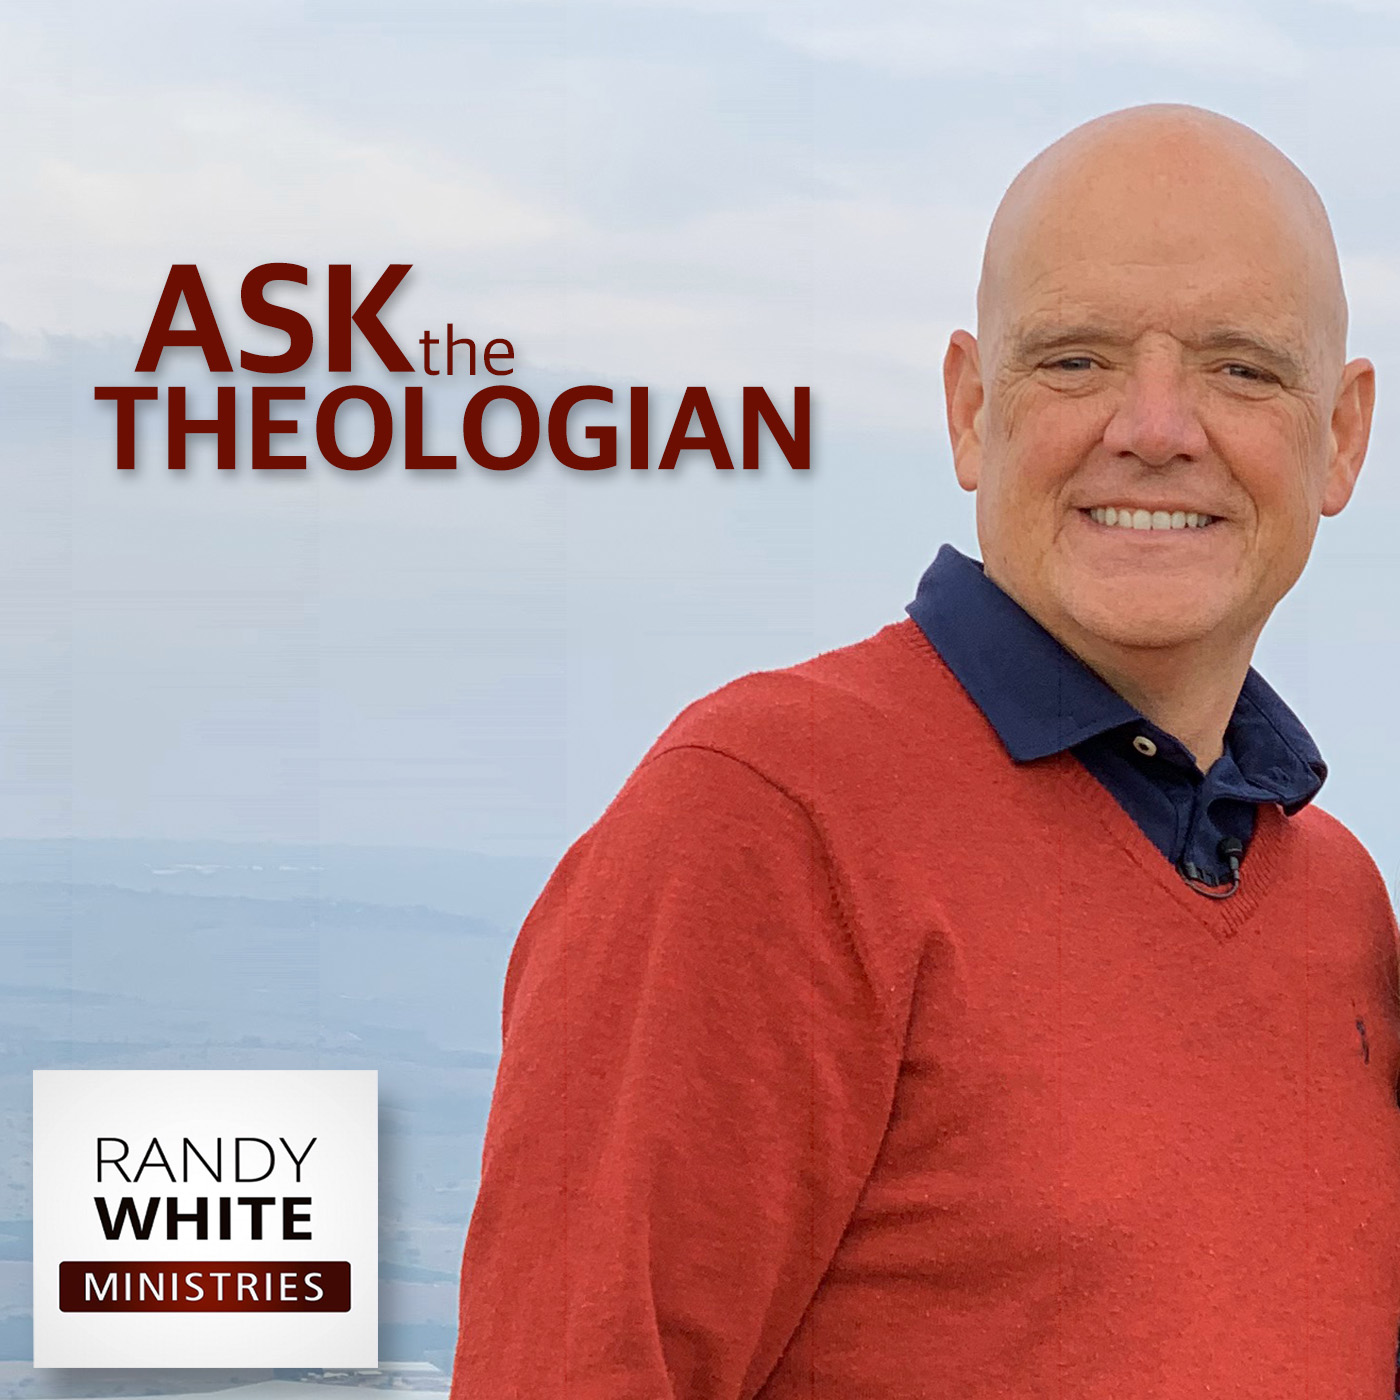 RWM: Ask the Theologian